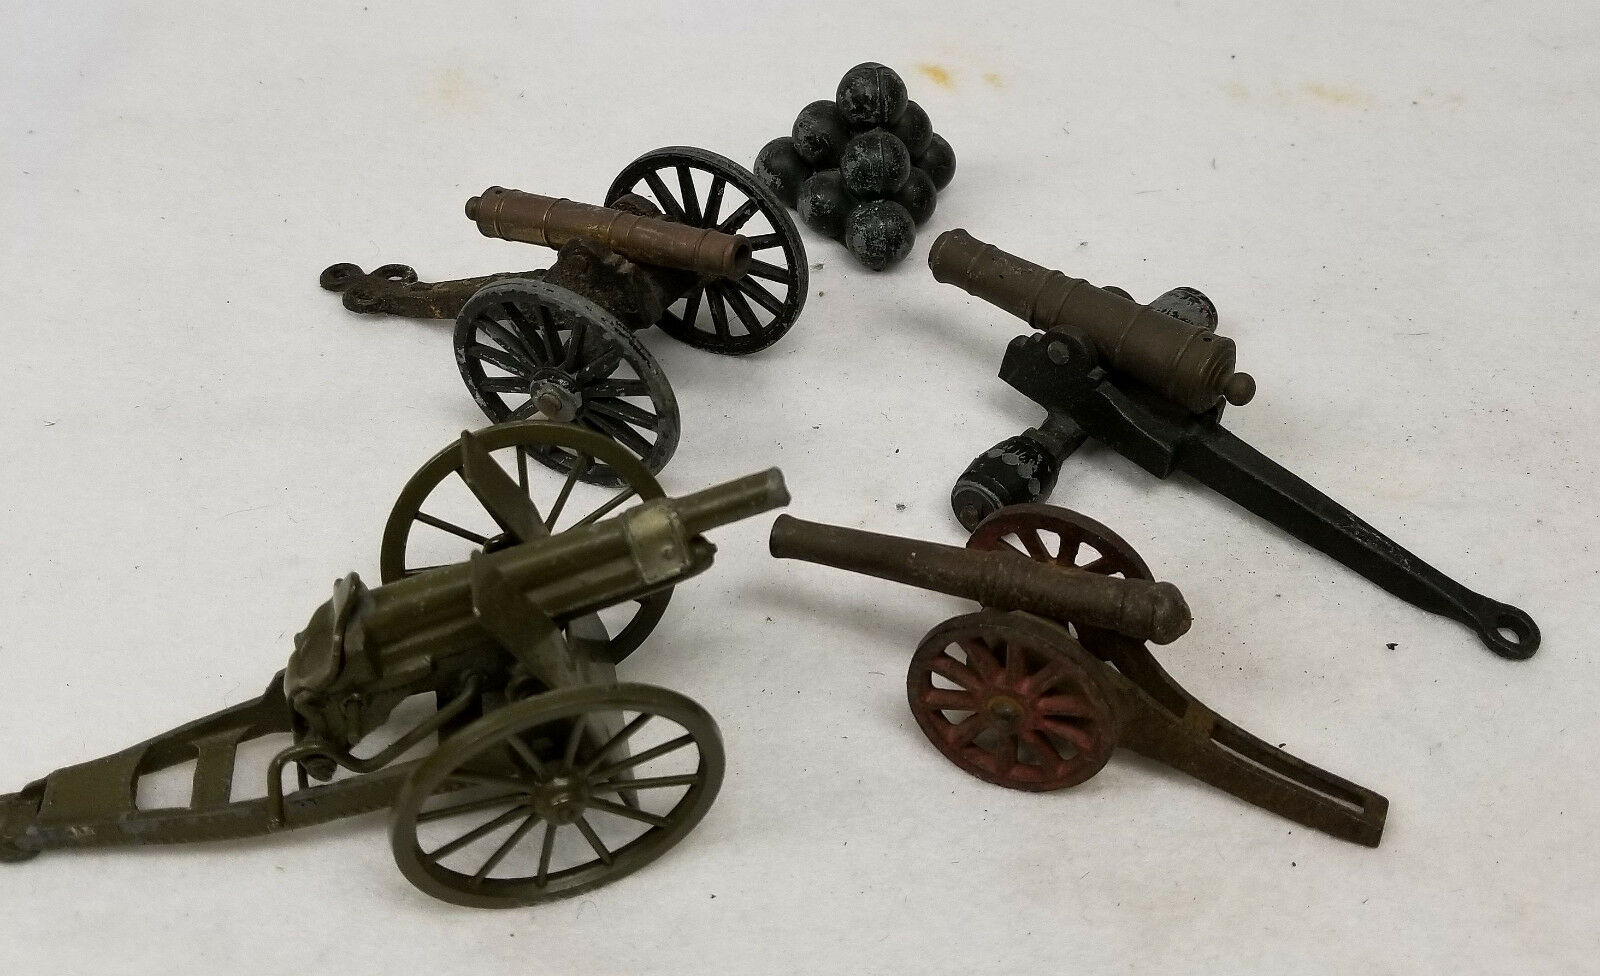 Antique Vintage Lot of Cannon Toys Miniature Models Howitzer Cast Iron